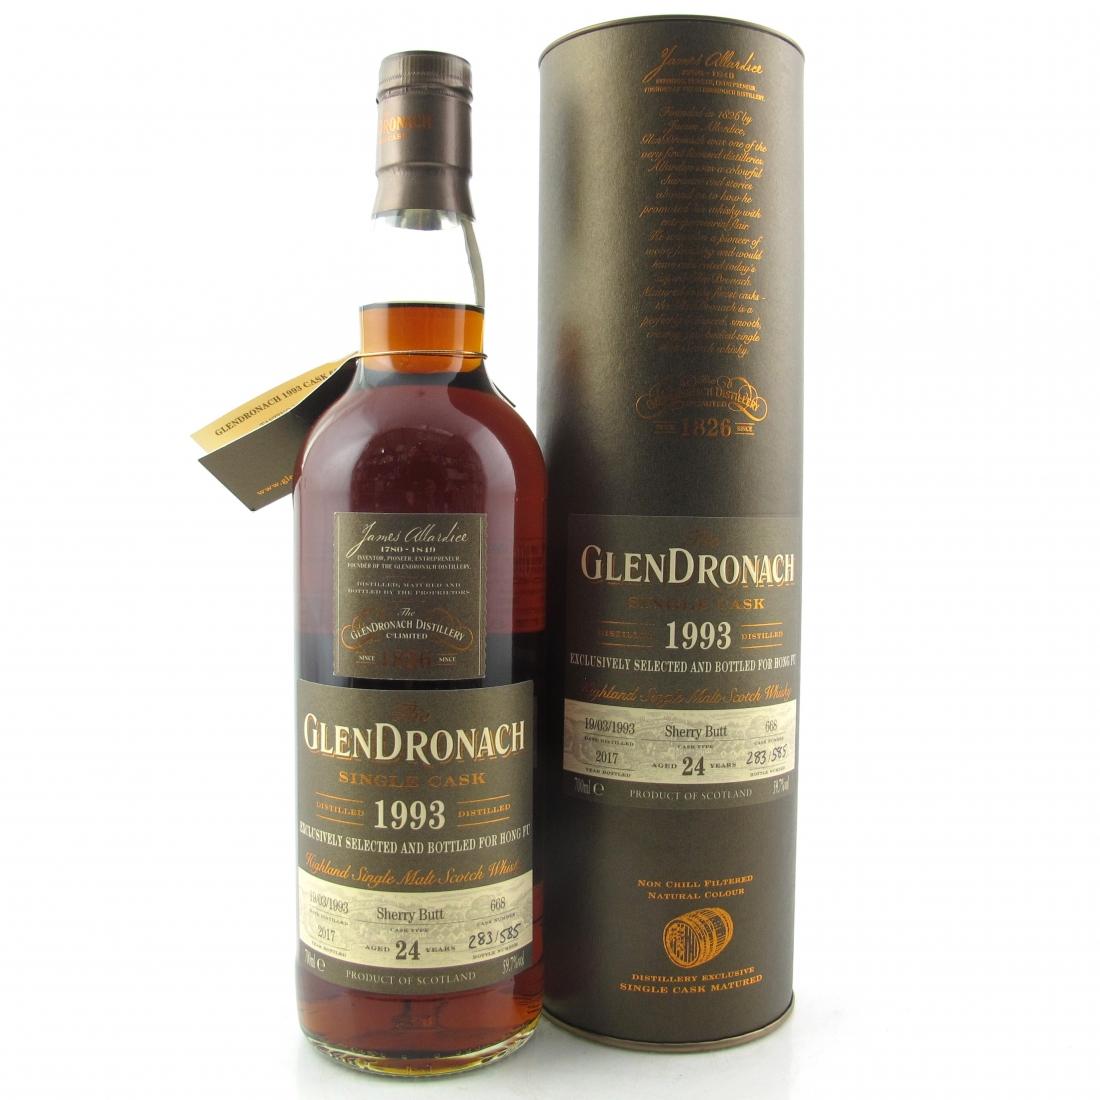 Glendronach 1993 Single Cask 24 Year Old #668 / Hong Fu